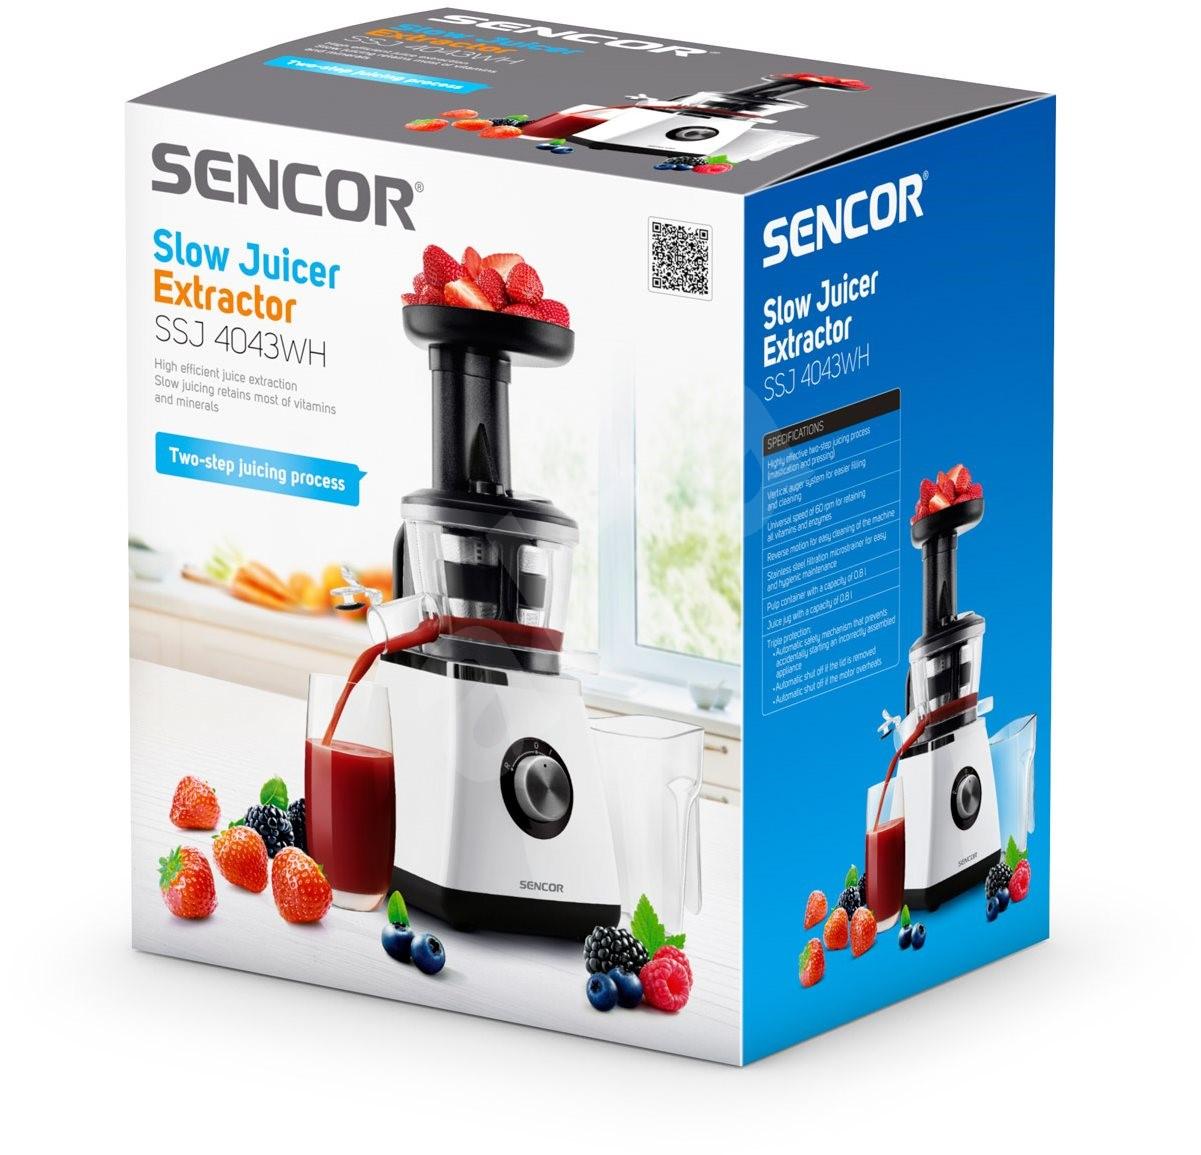 Sencor Slow Juicer Extractor Ssj 4043wh : Sencor SSJ 4043WH - Juicer Alzashop.com